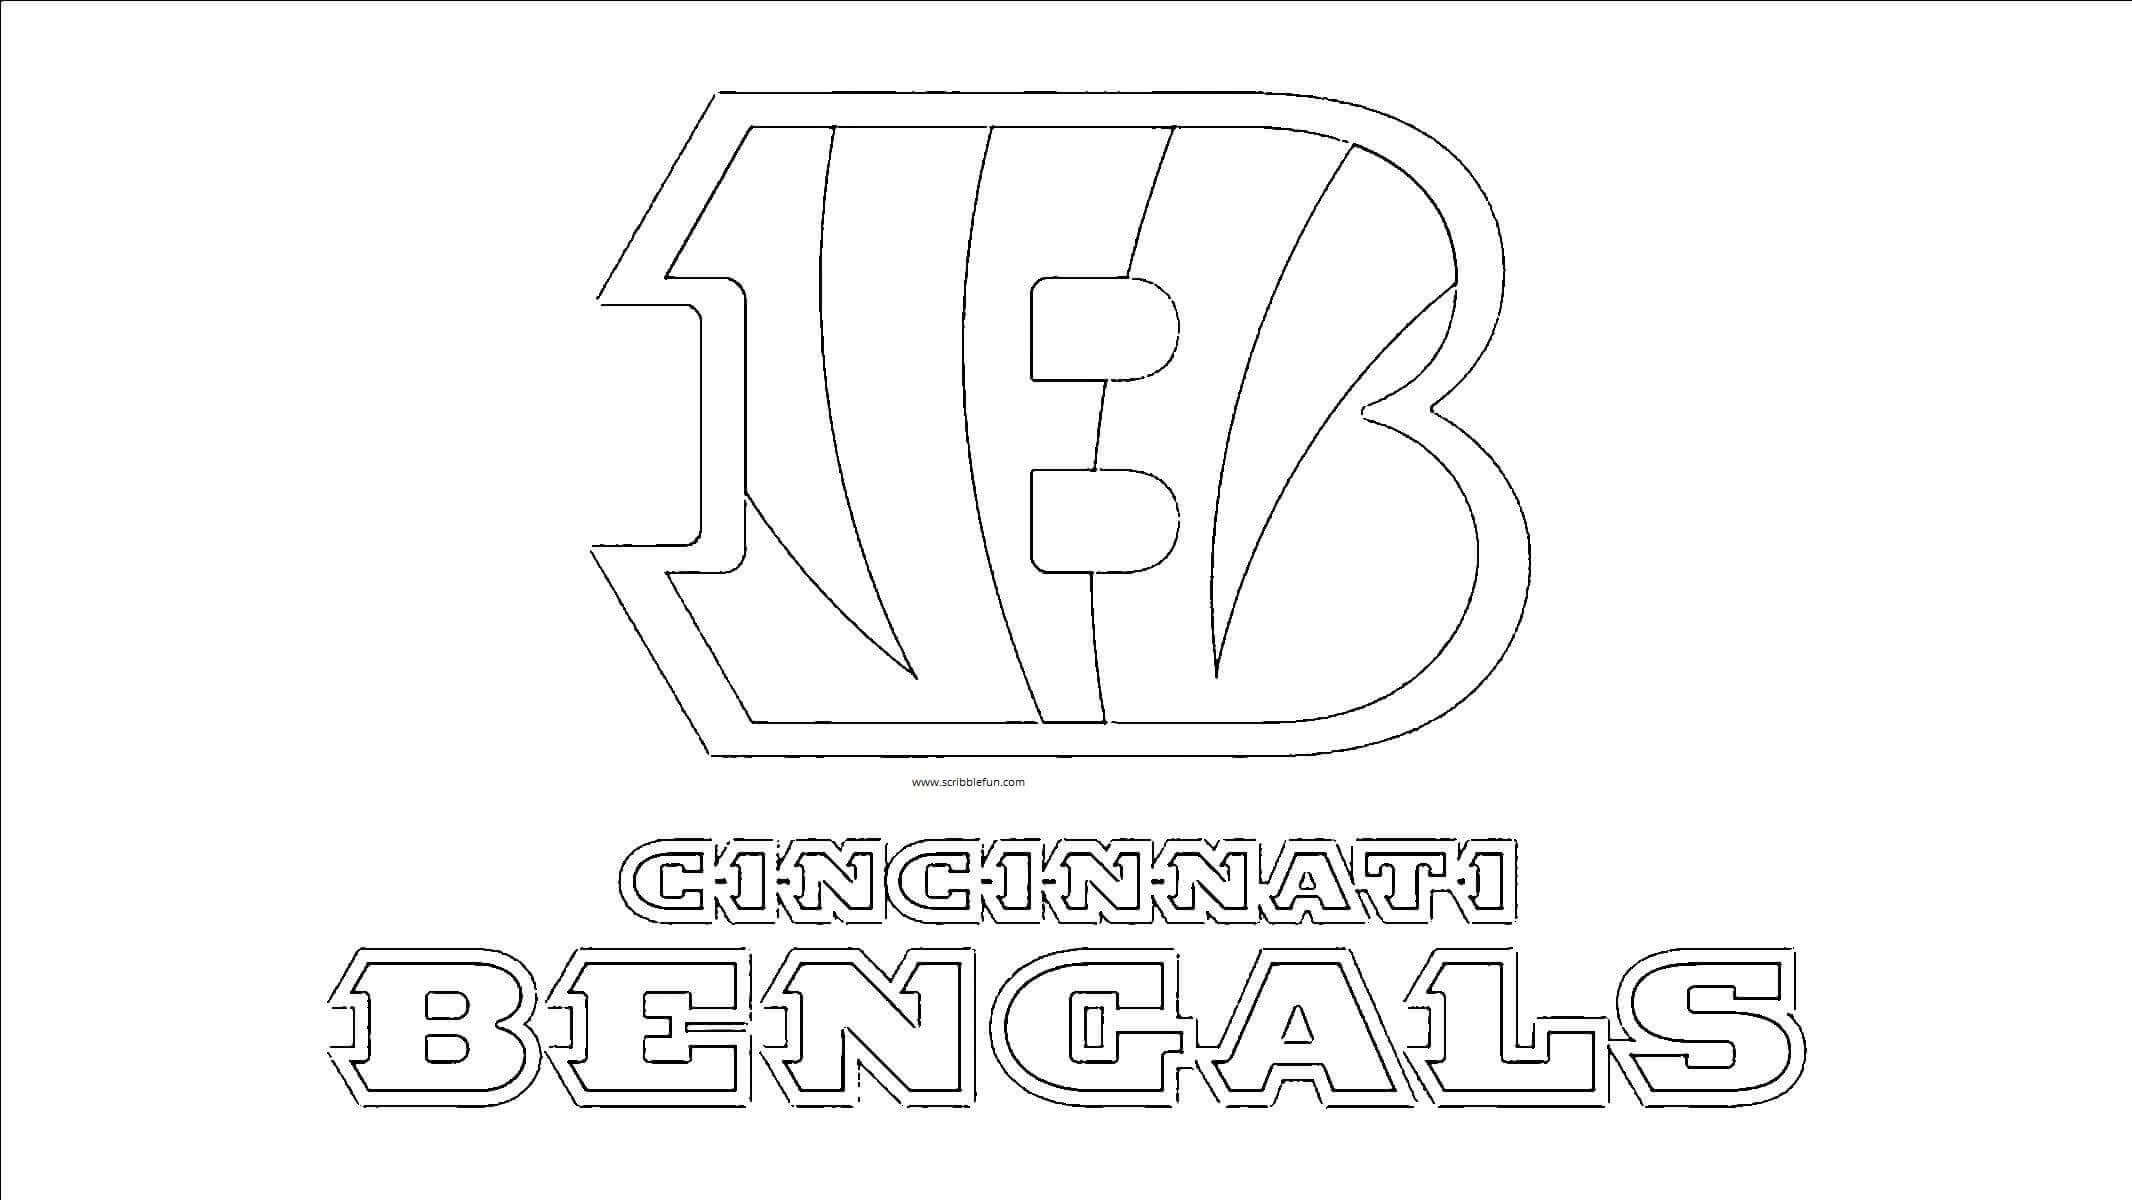 Cincinnati Bengals Coloring Page